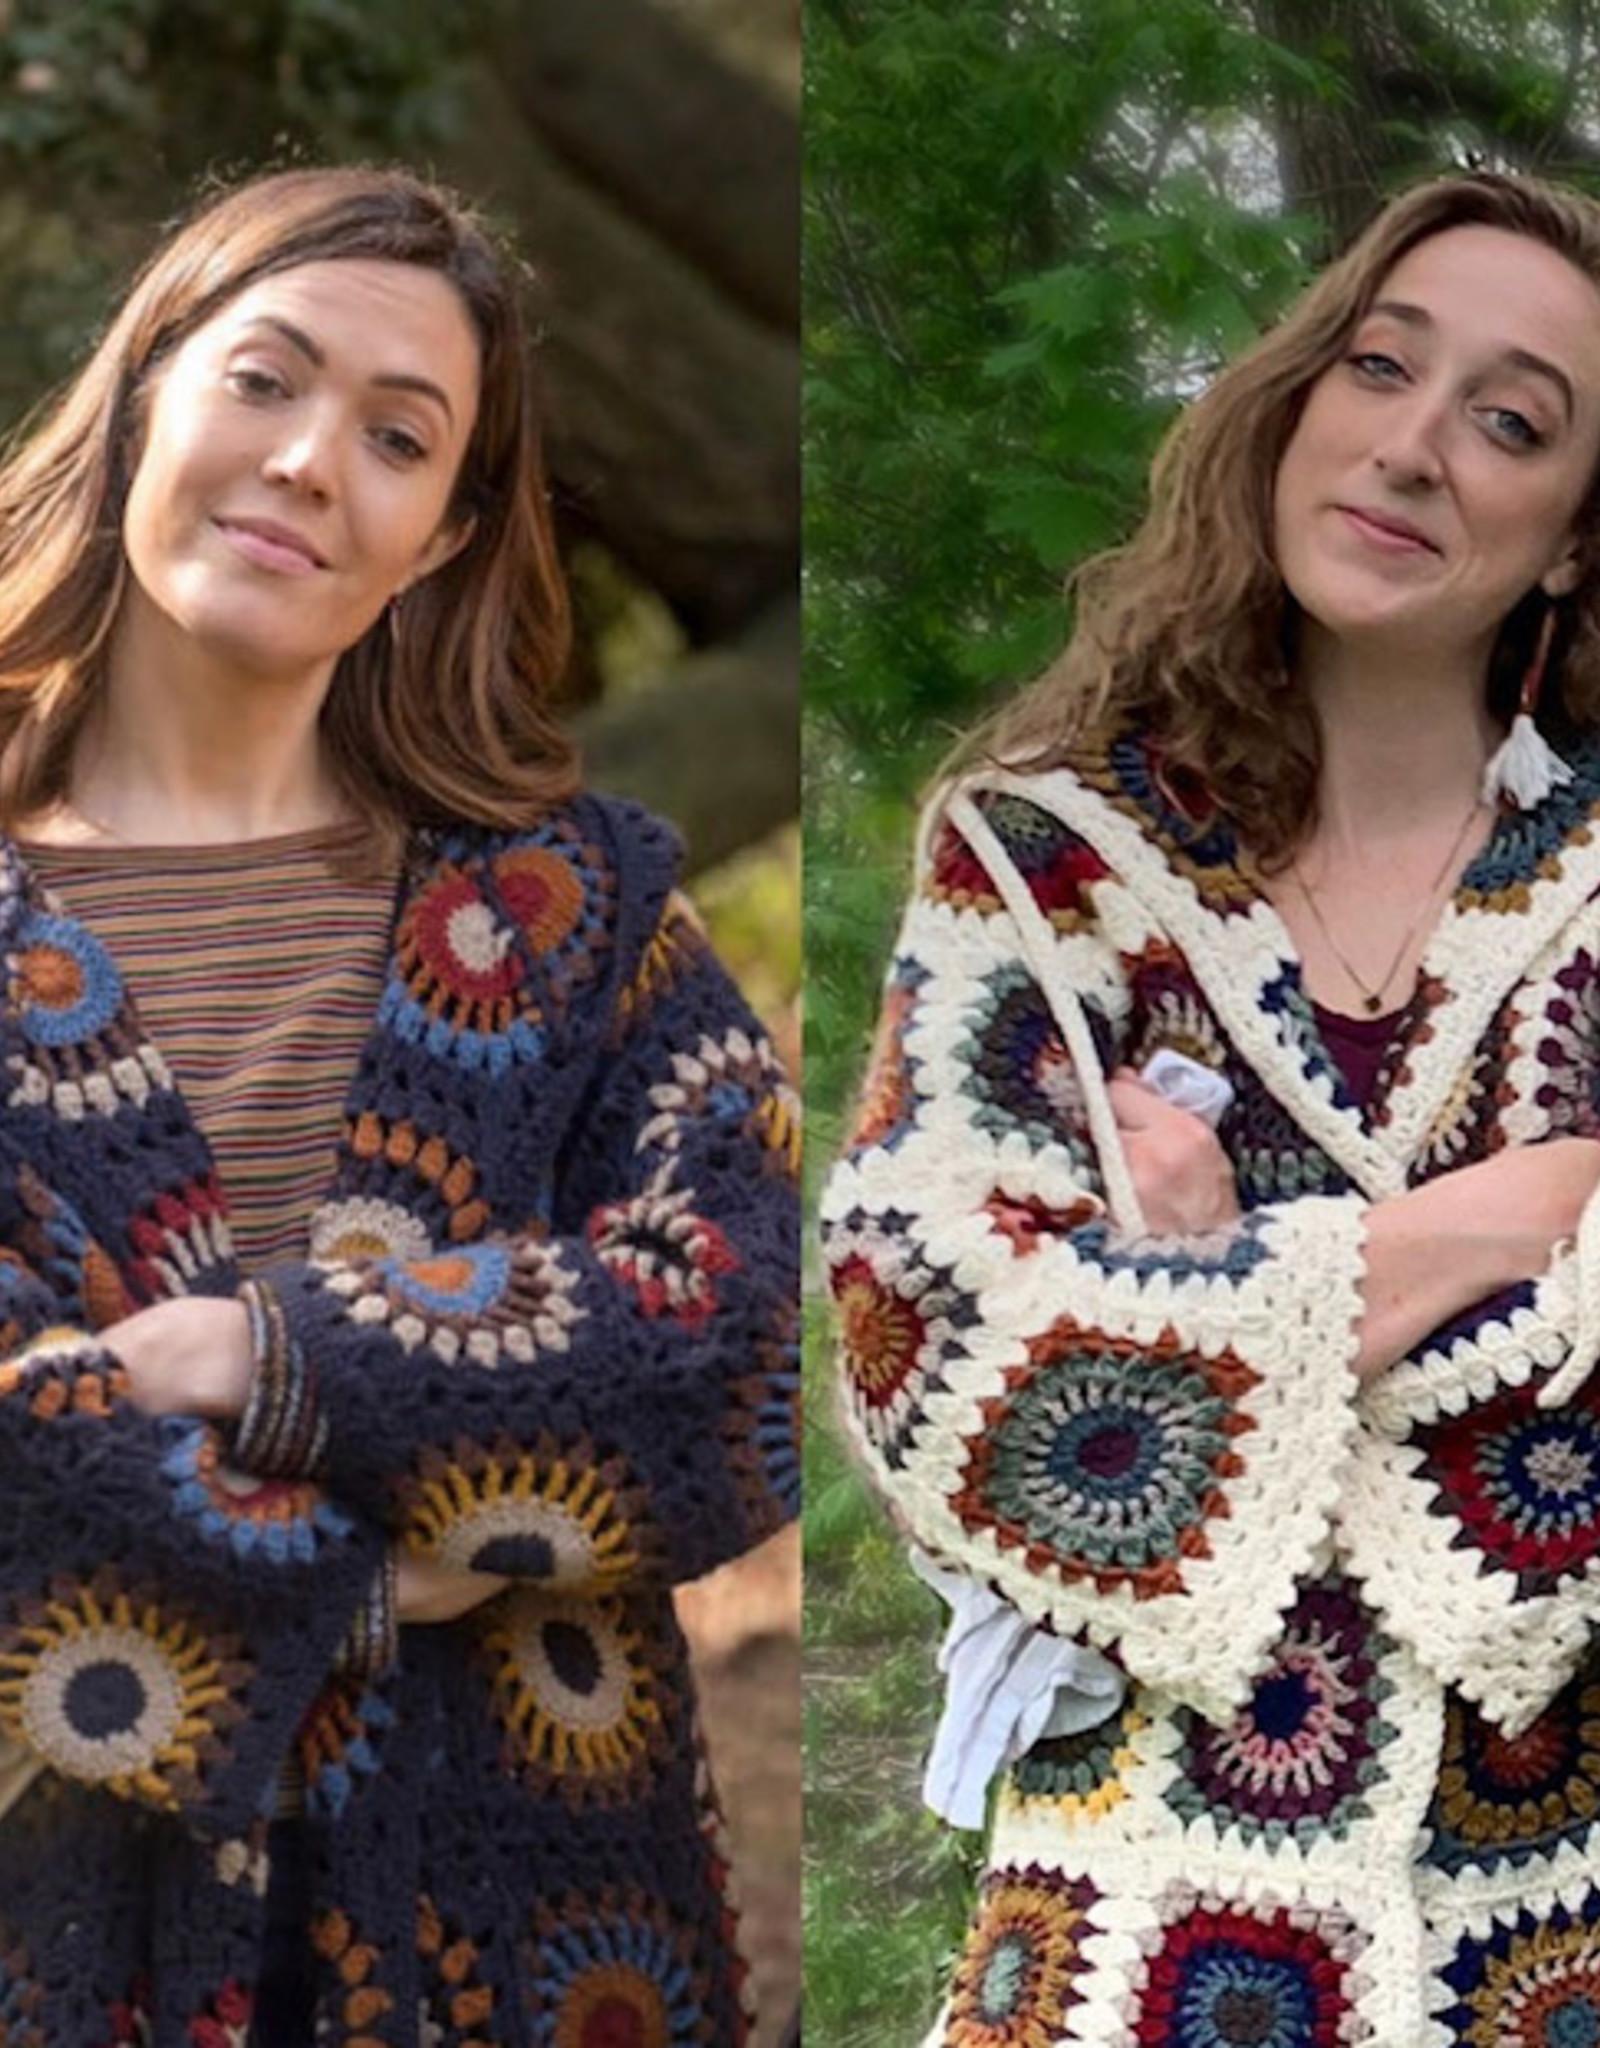 Granny Square Rebecca Jacket Kit - No Pattern